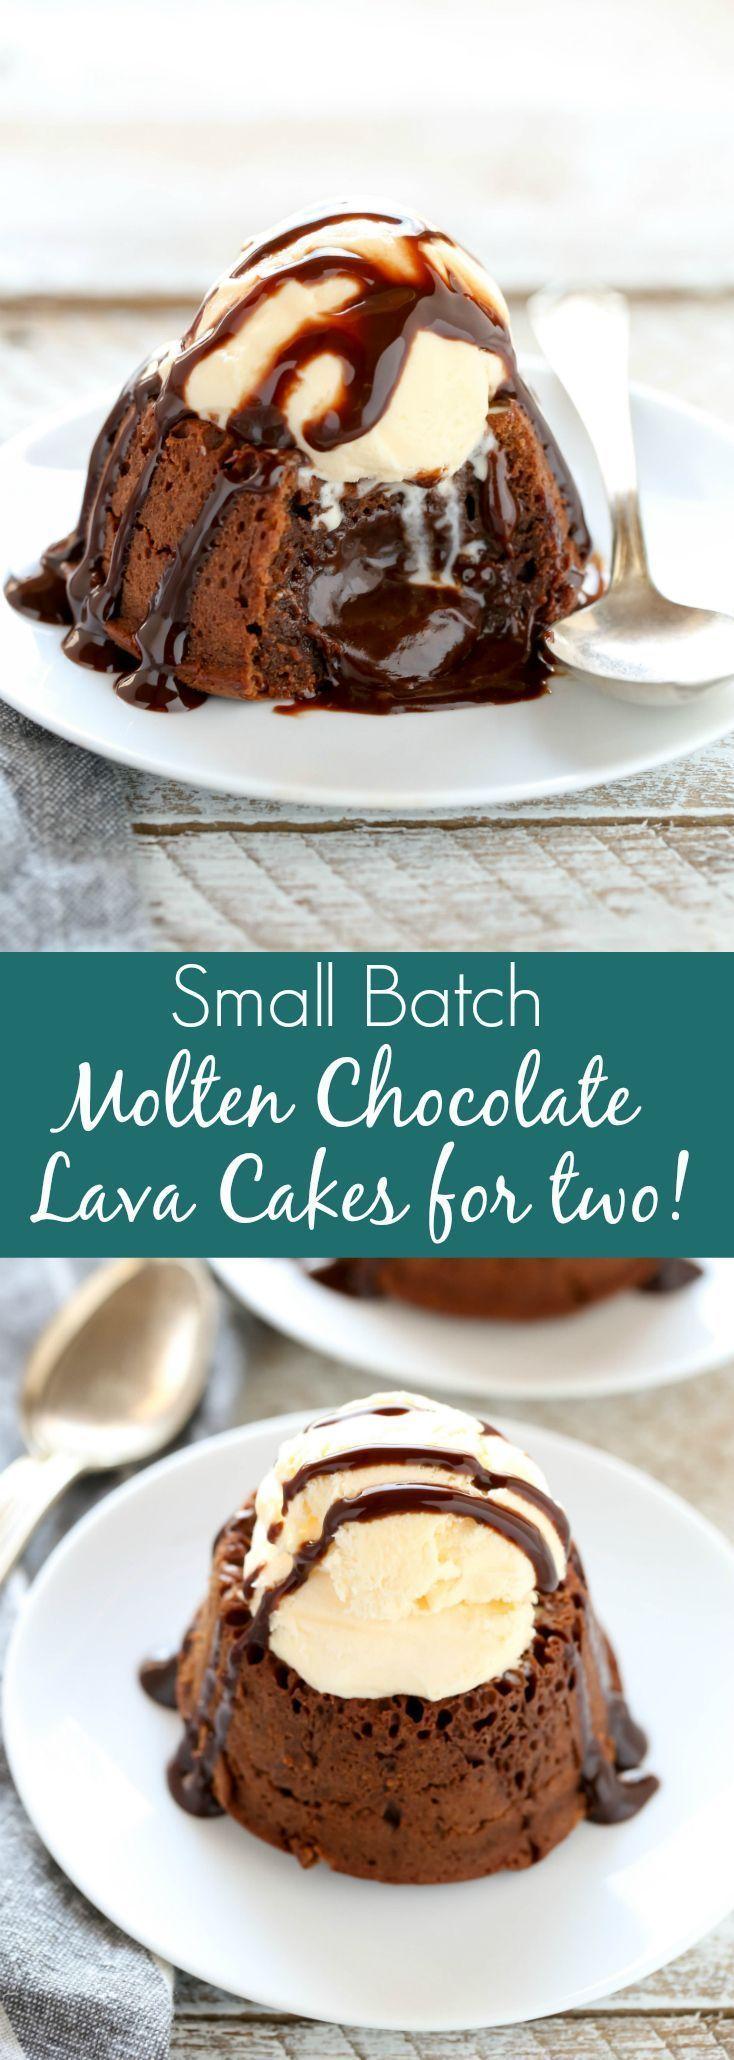 Quick and easy chocolate lava cake recipe